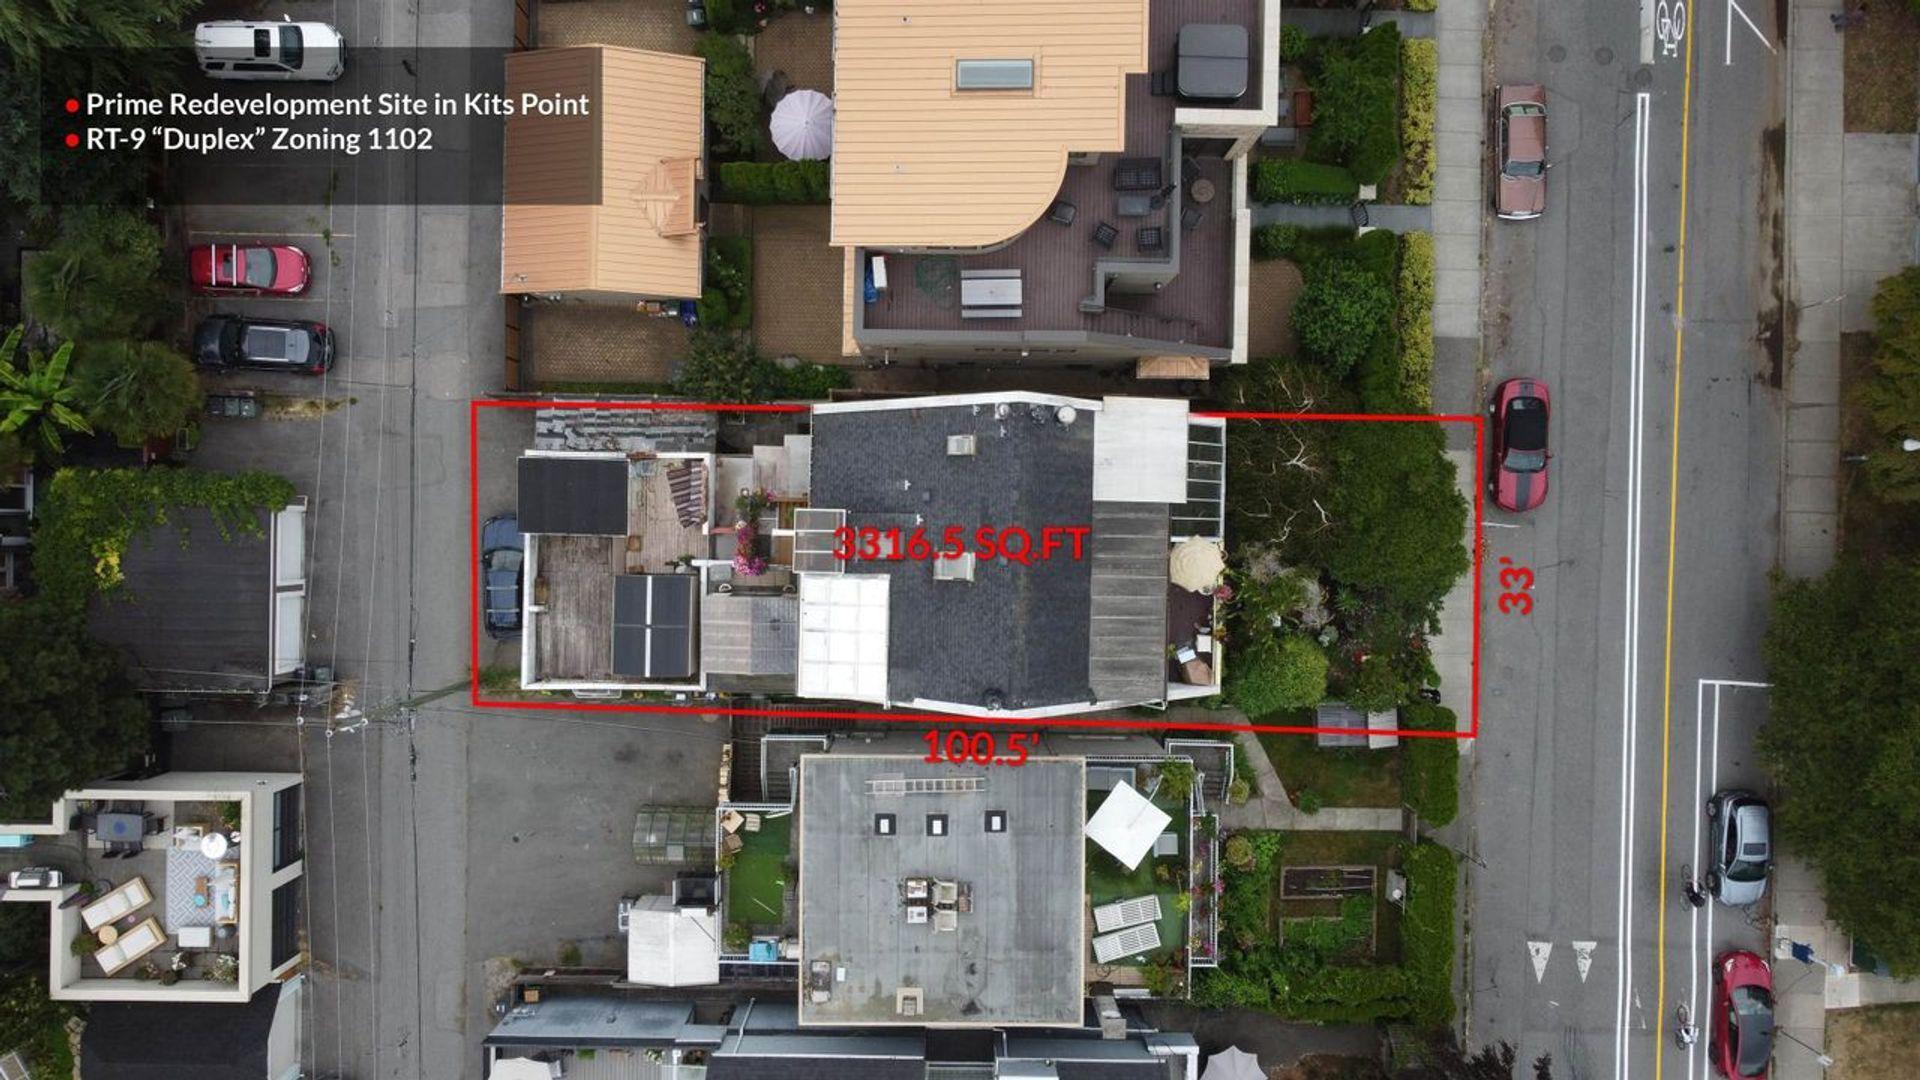 1354-arbutus-street-kitsilano-vancouver-west-02-1 at 1354 Arbutus Street, Kitsilano, Vancouver West